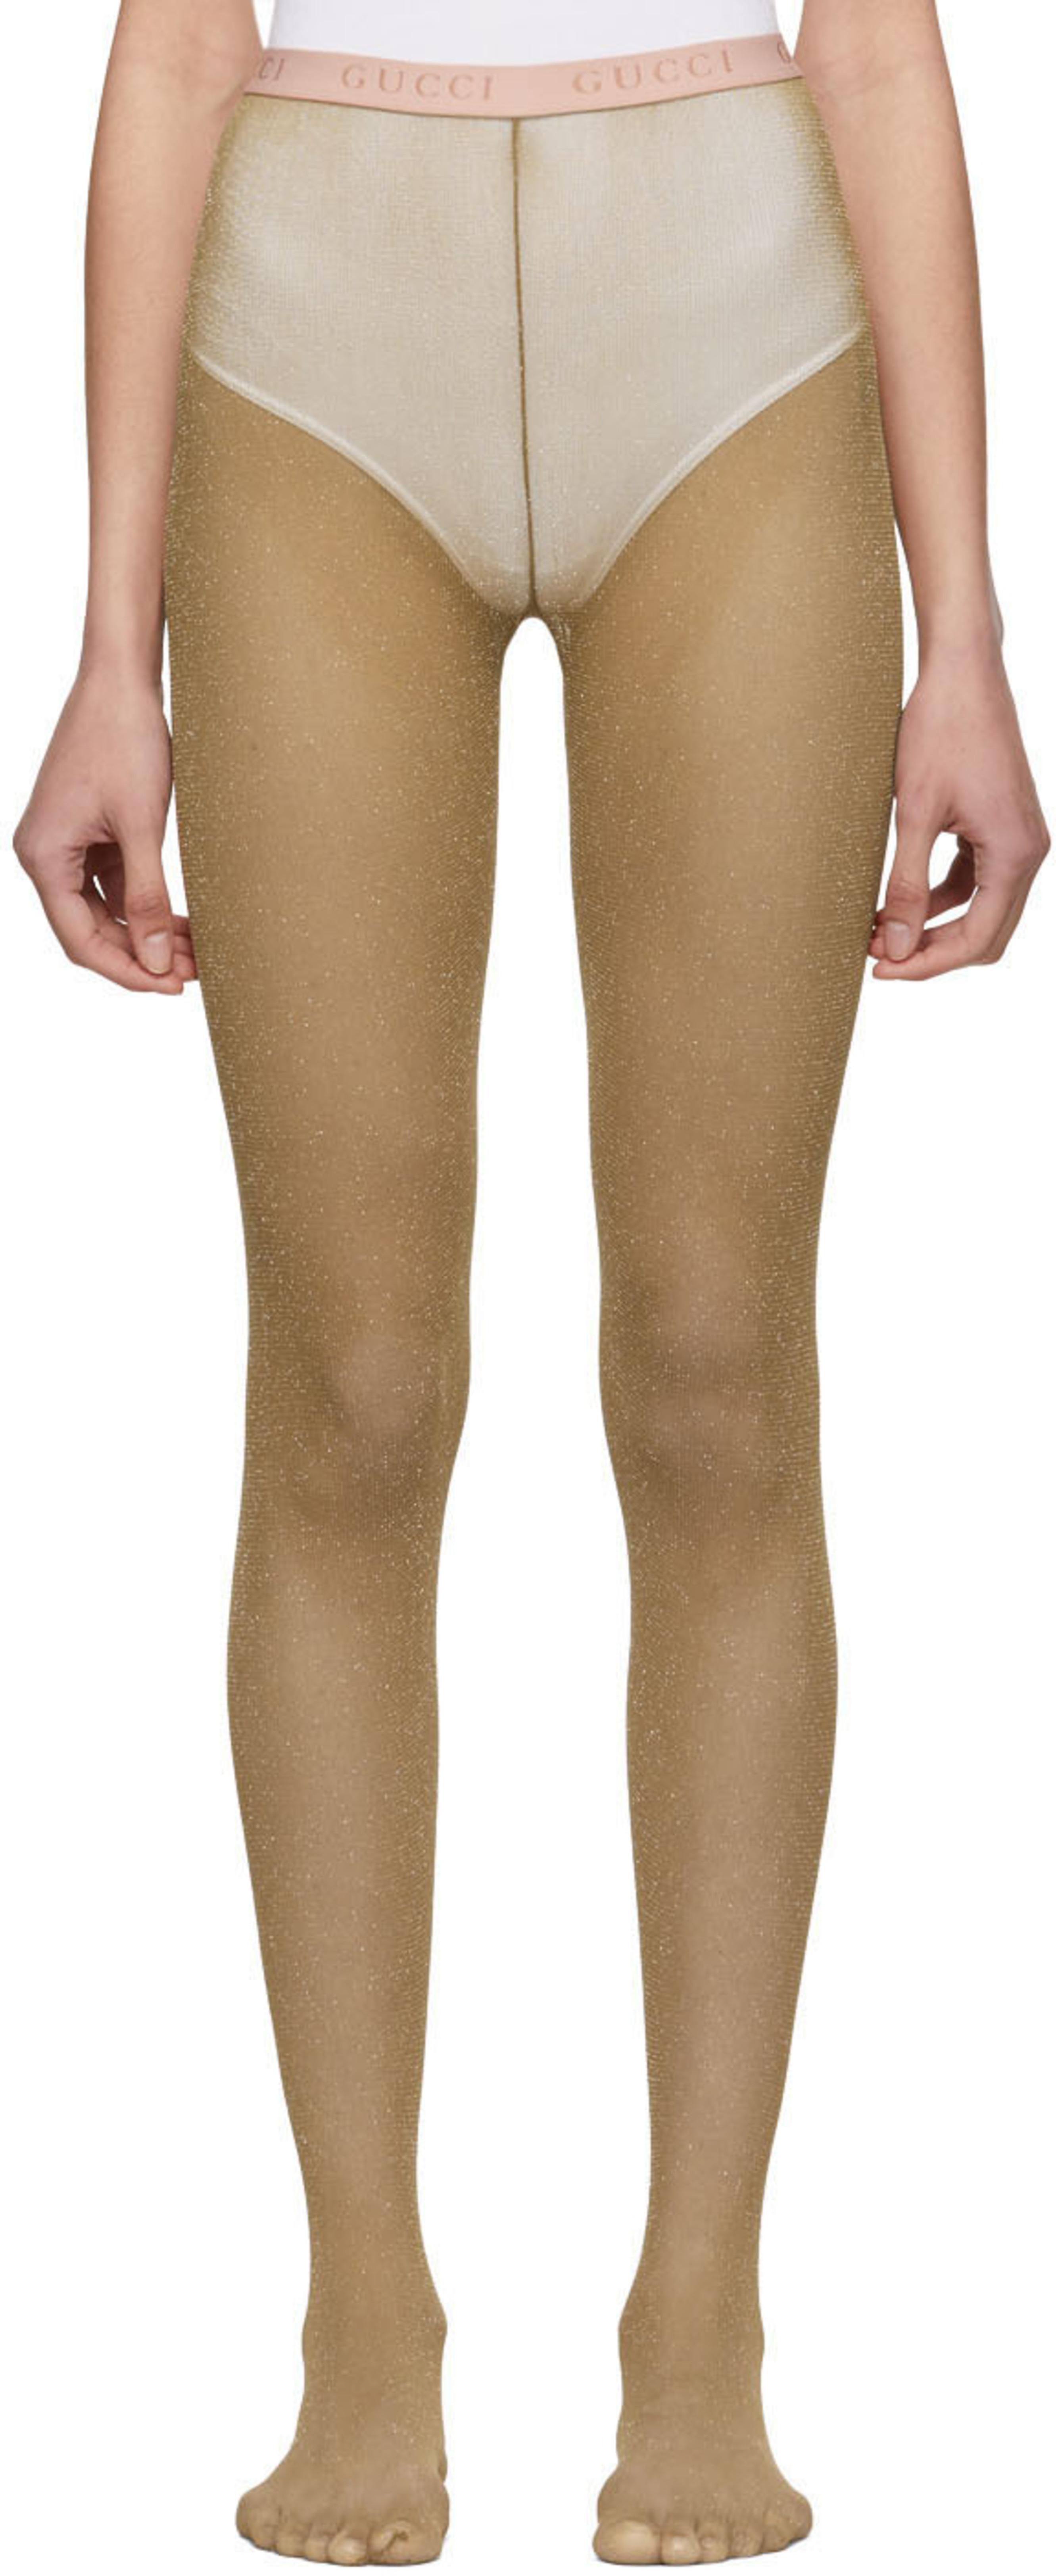 543c7a8349de7 Gucci socks for Women | SSENSE Canada